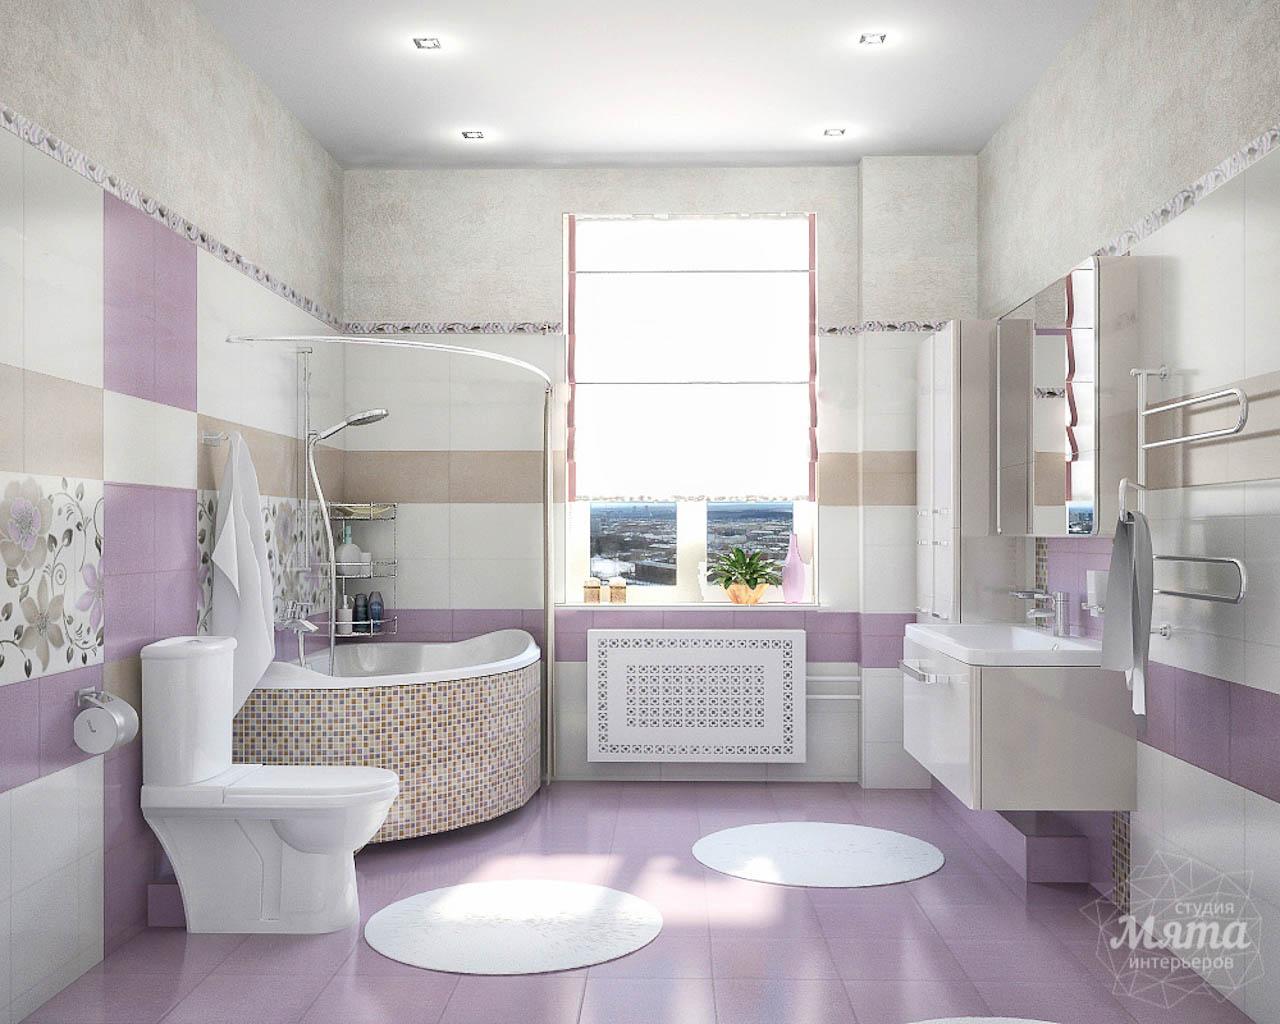 Дизайн интерьера и ремонт трехкомнатной квартиры по ул. Чкалова 124 img245180236